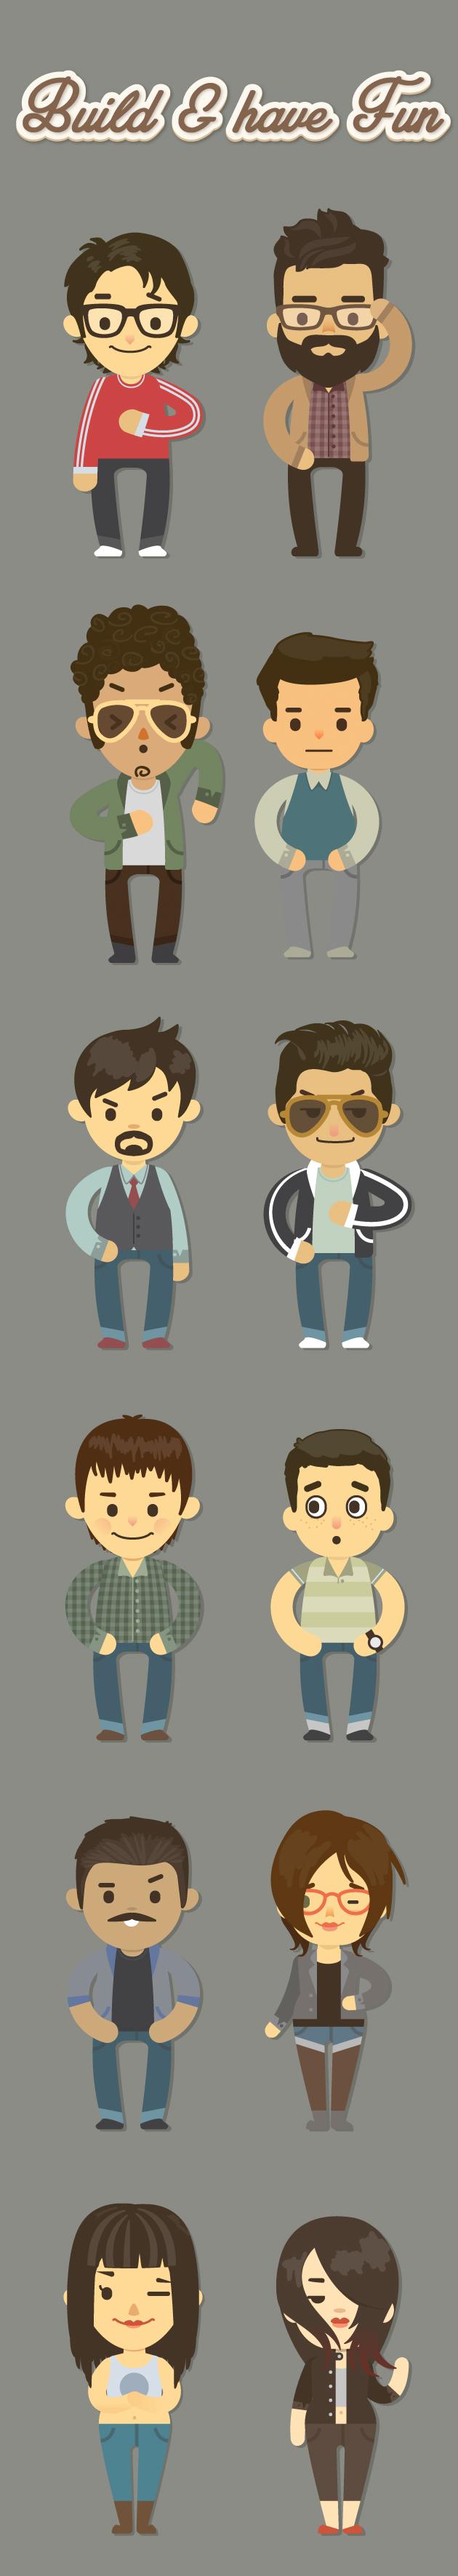 Cartoon Character Design Website : Cute cartoon character generator over items